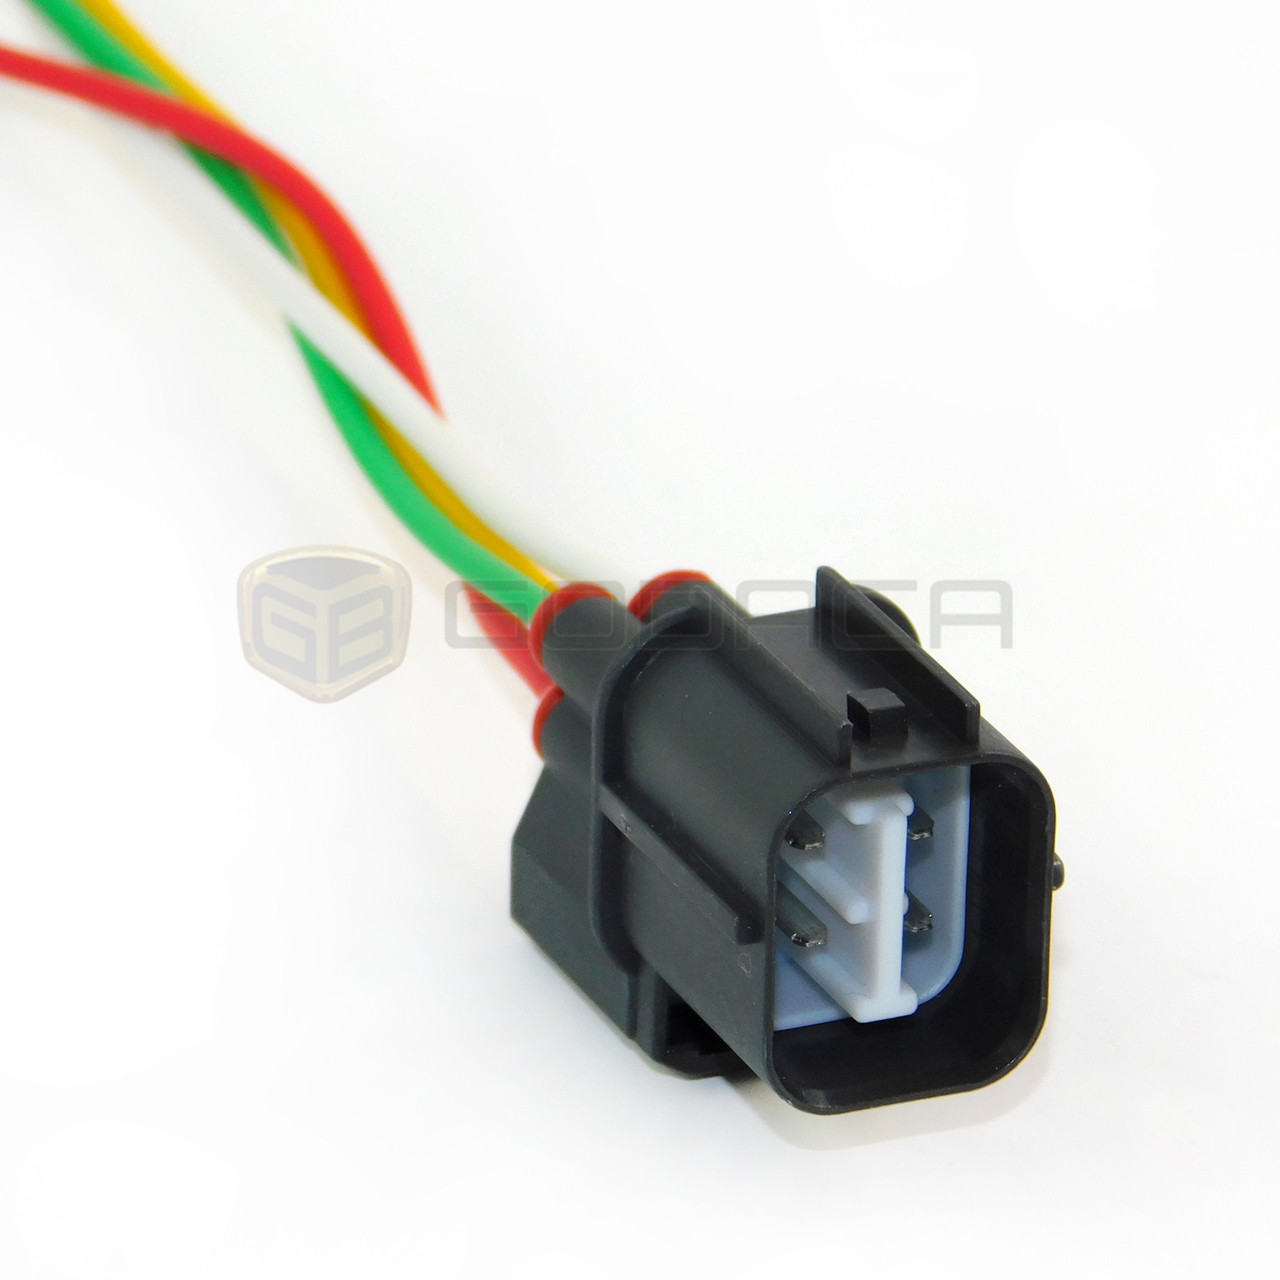 1x Connector 4-way 4-pin Male for O2 Sensor Honda Acura - Godaca, LLC.